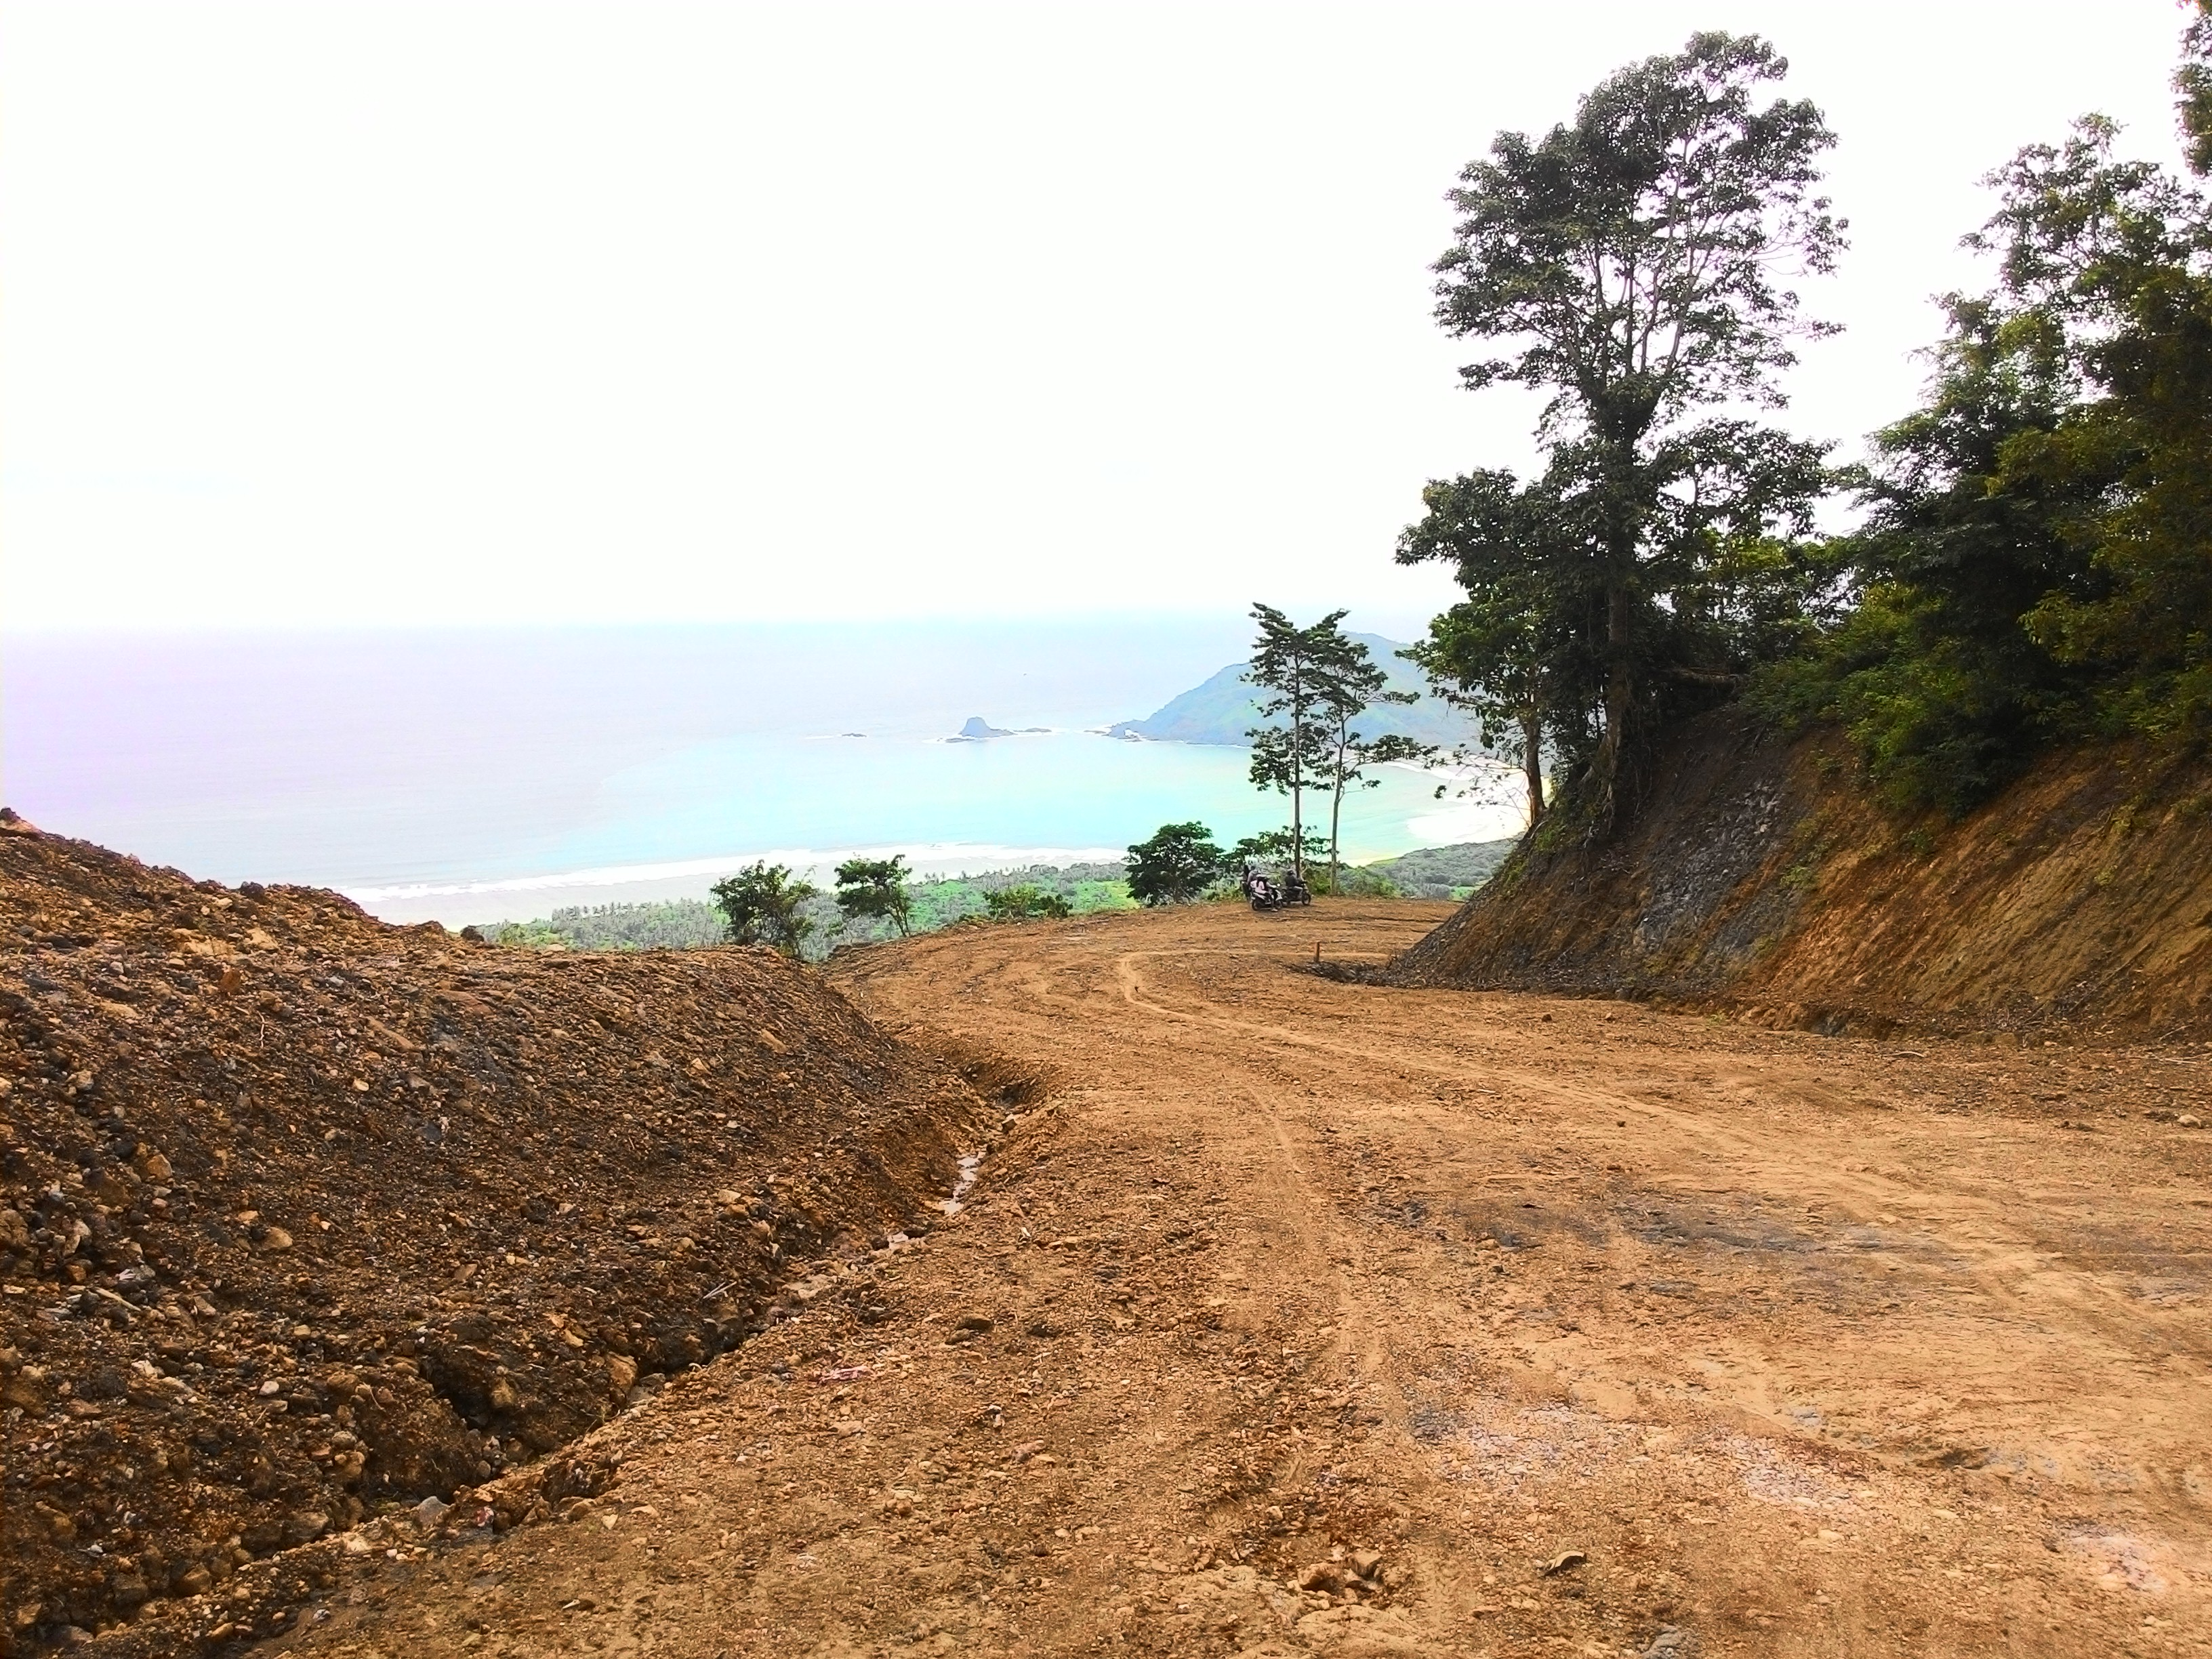 Pantai Teluk Mekaki Lombok Barat Gerbang Wisata Tour Adventure Jalan